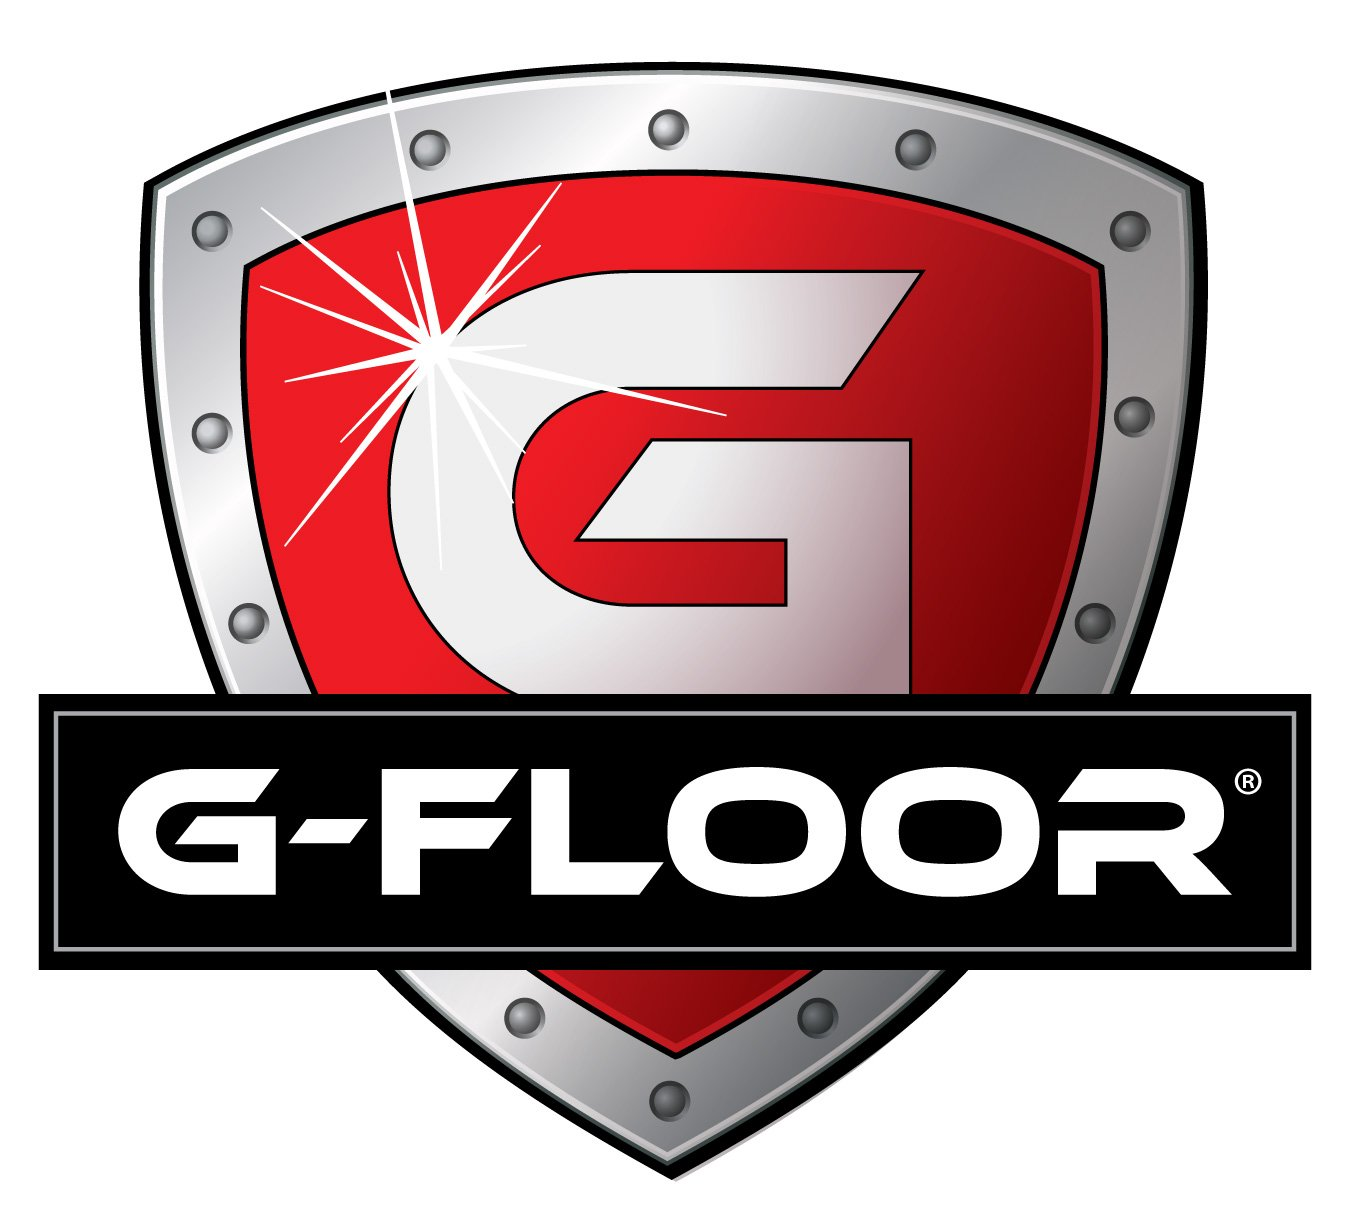 gfloor-logo.jpg